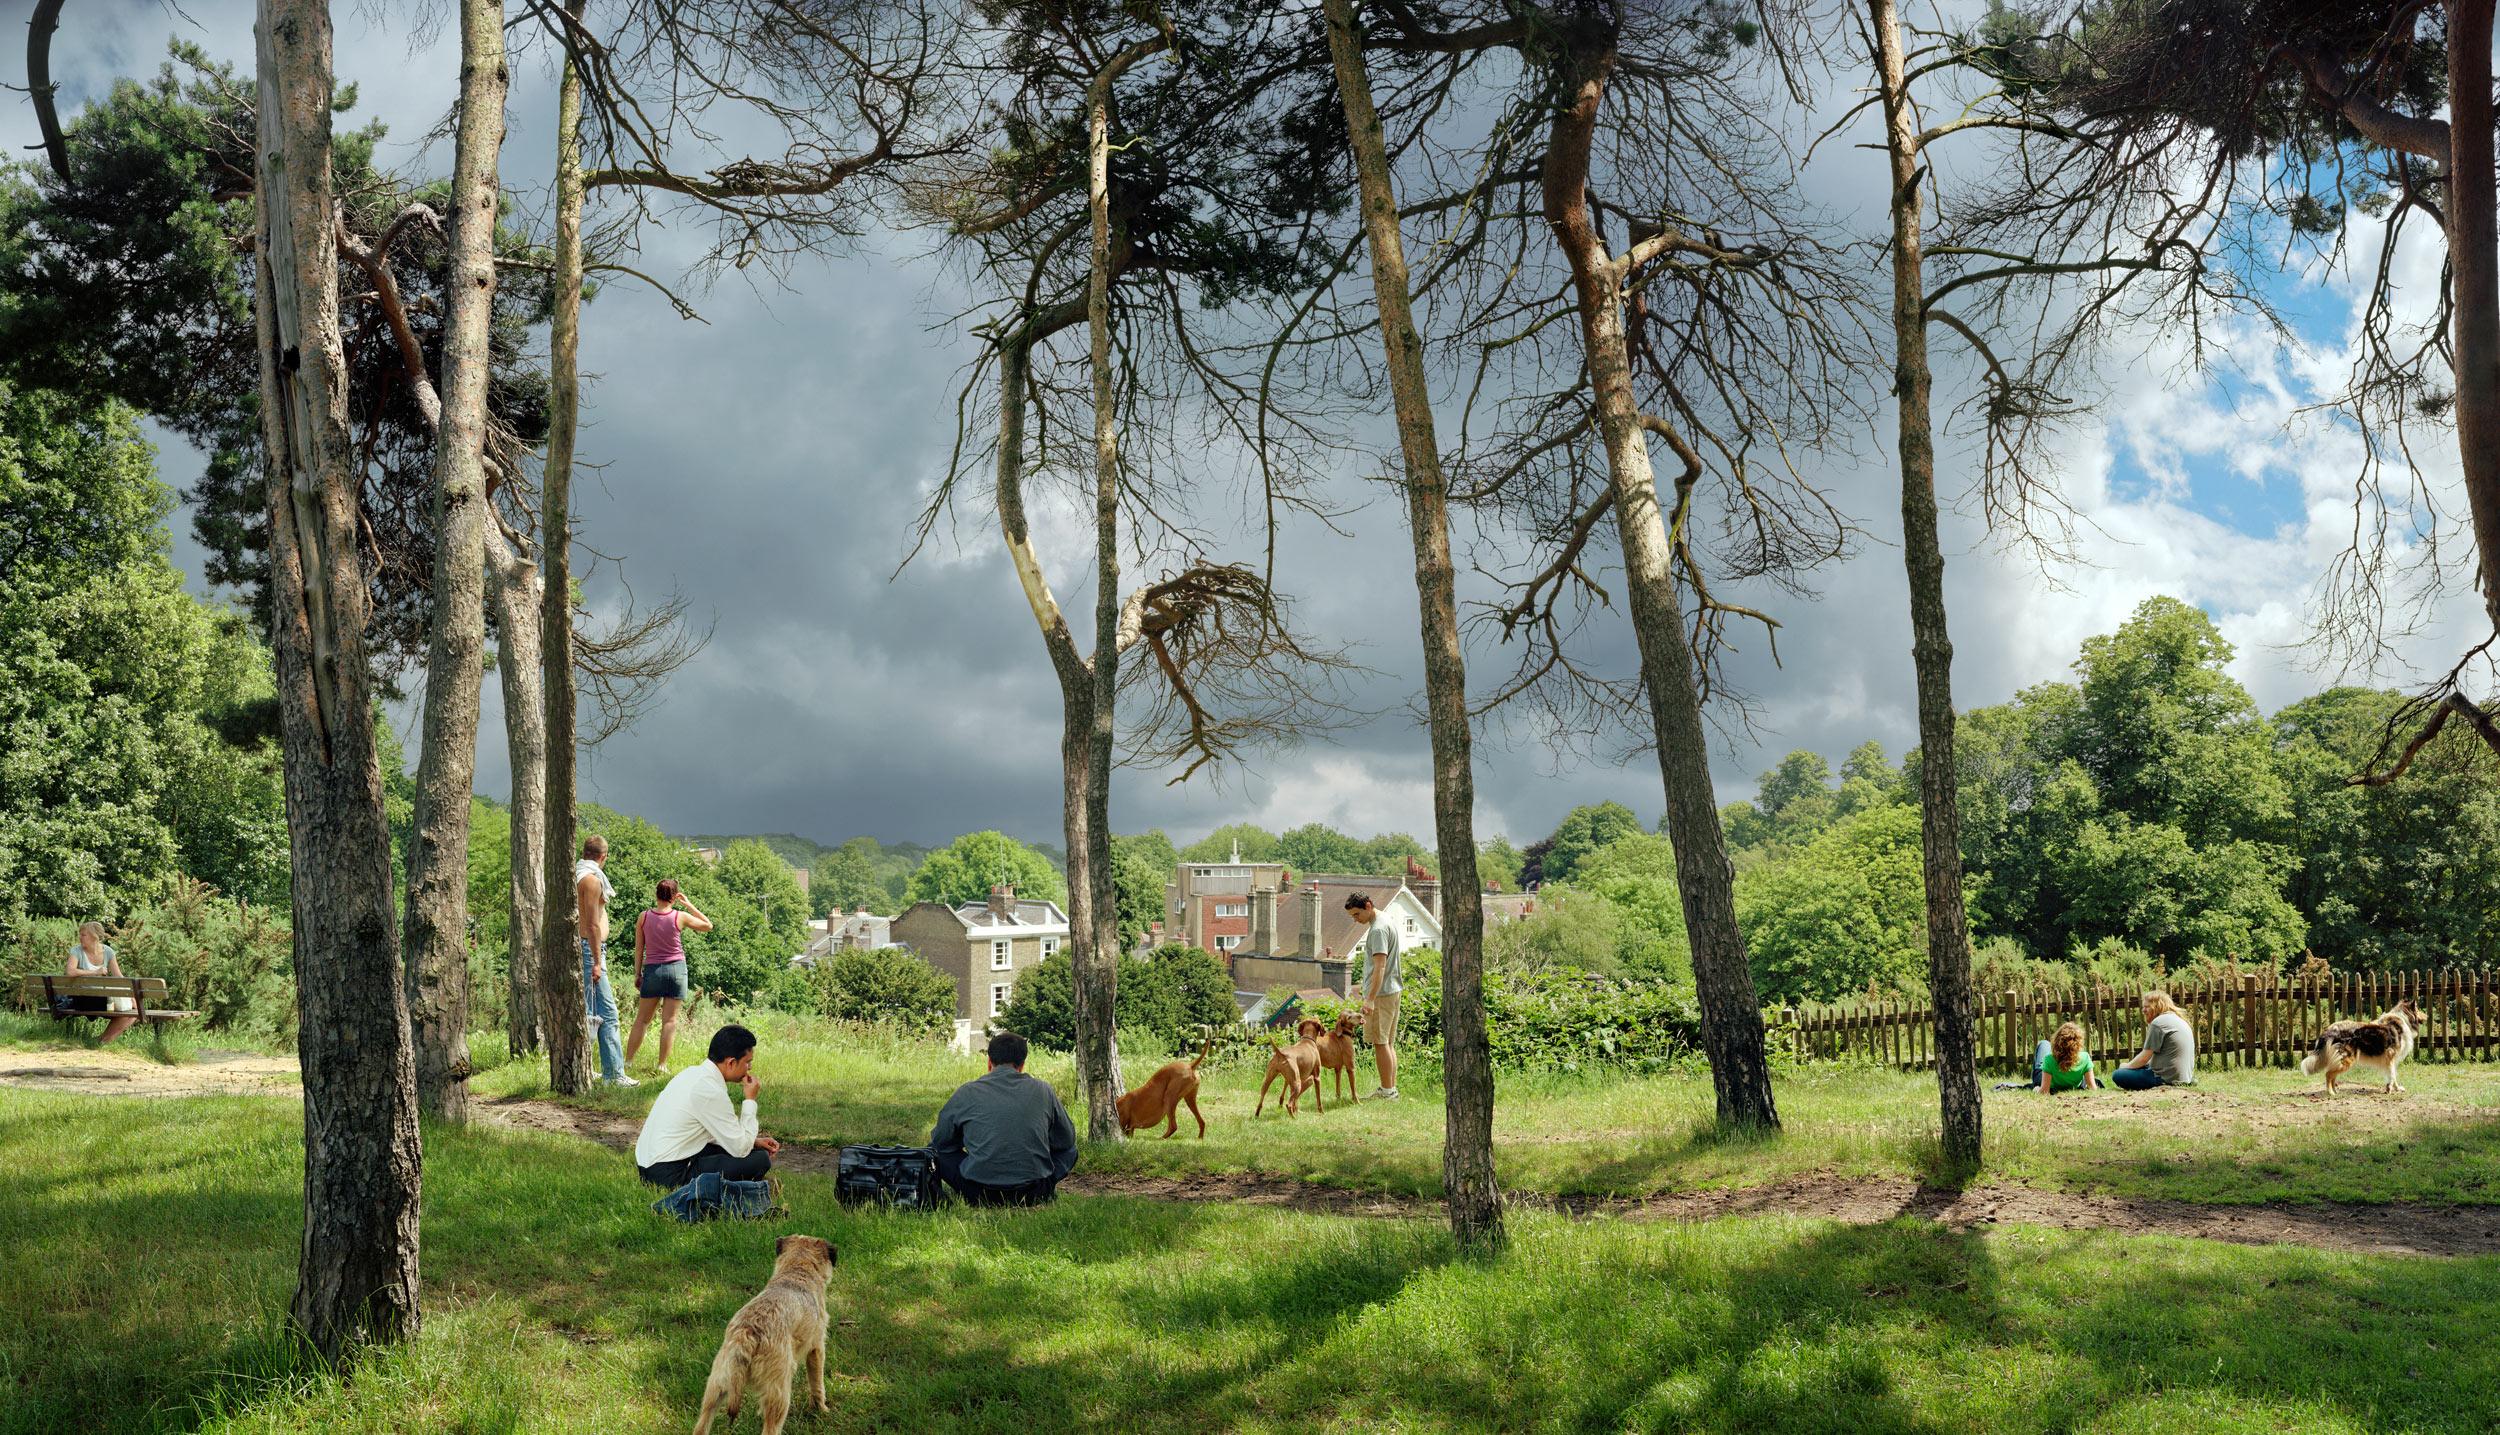 View of Vale of Heath, Looking Towards Hampstead